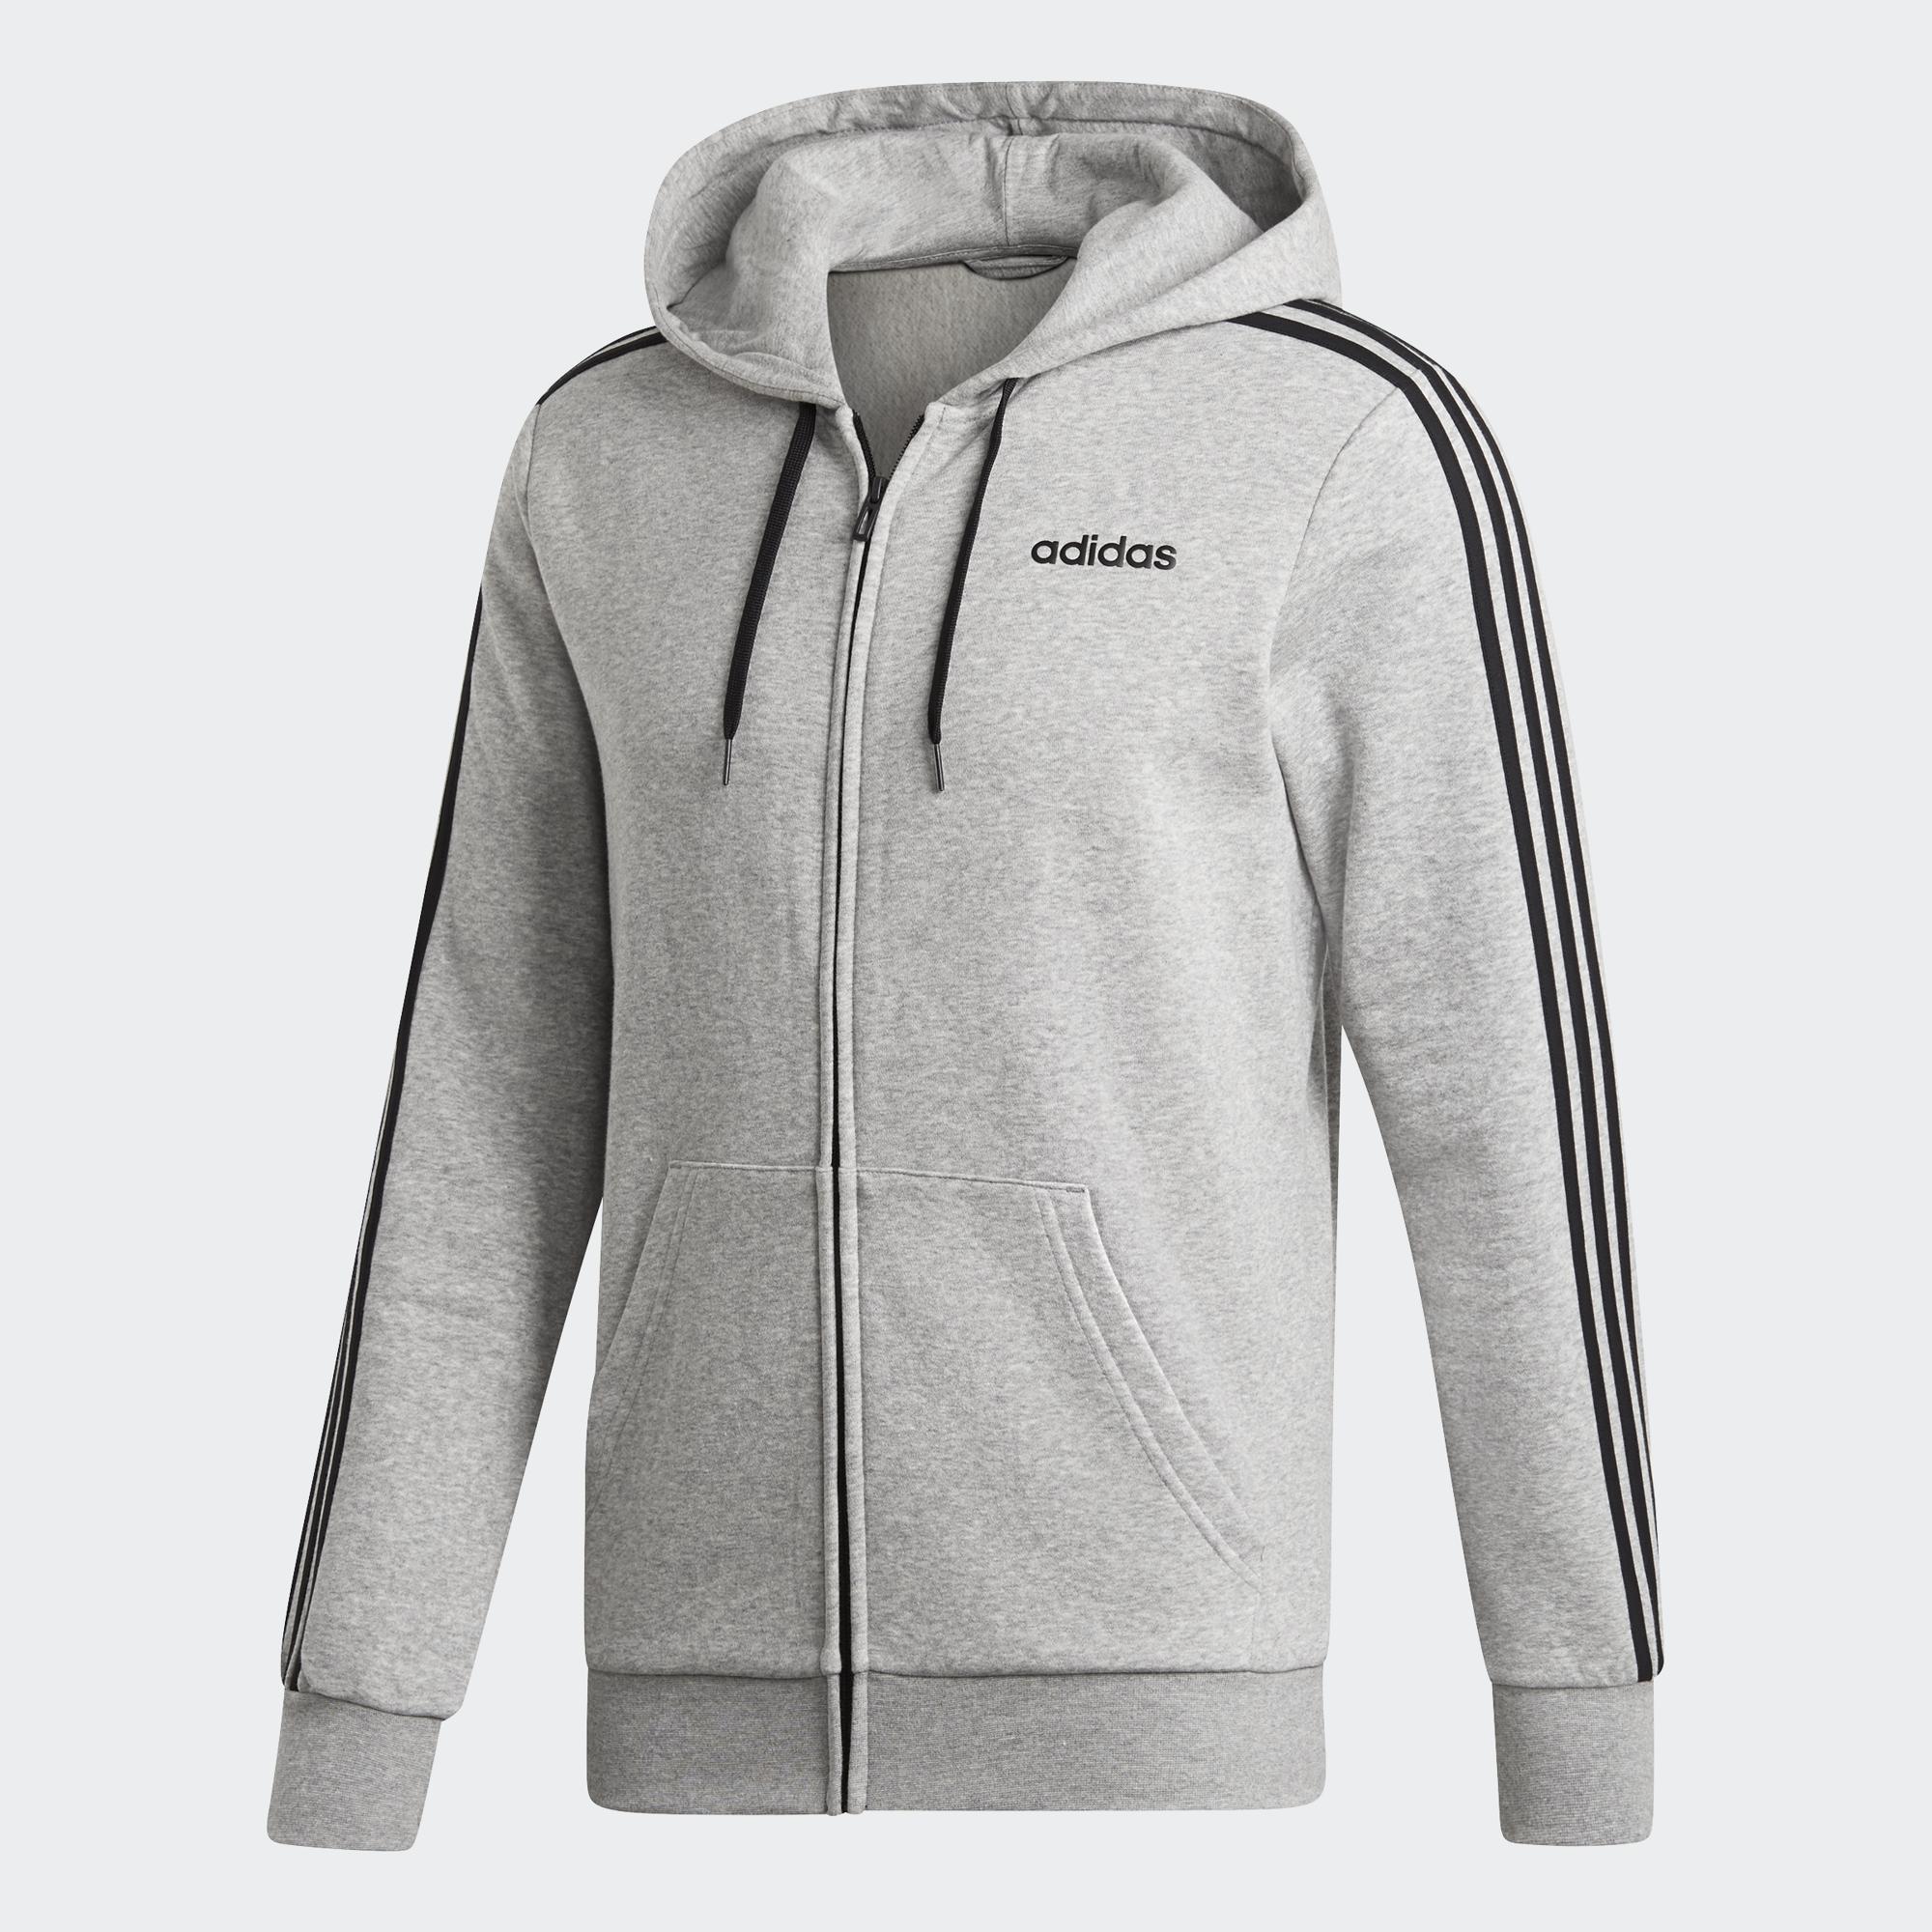 Adidas Essentials 3S Hoodie